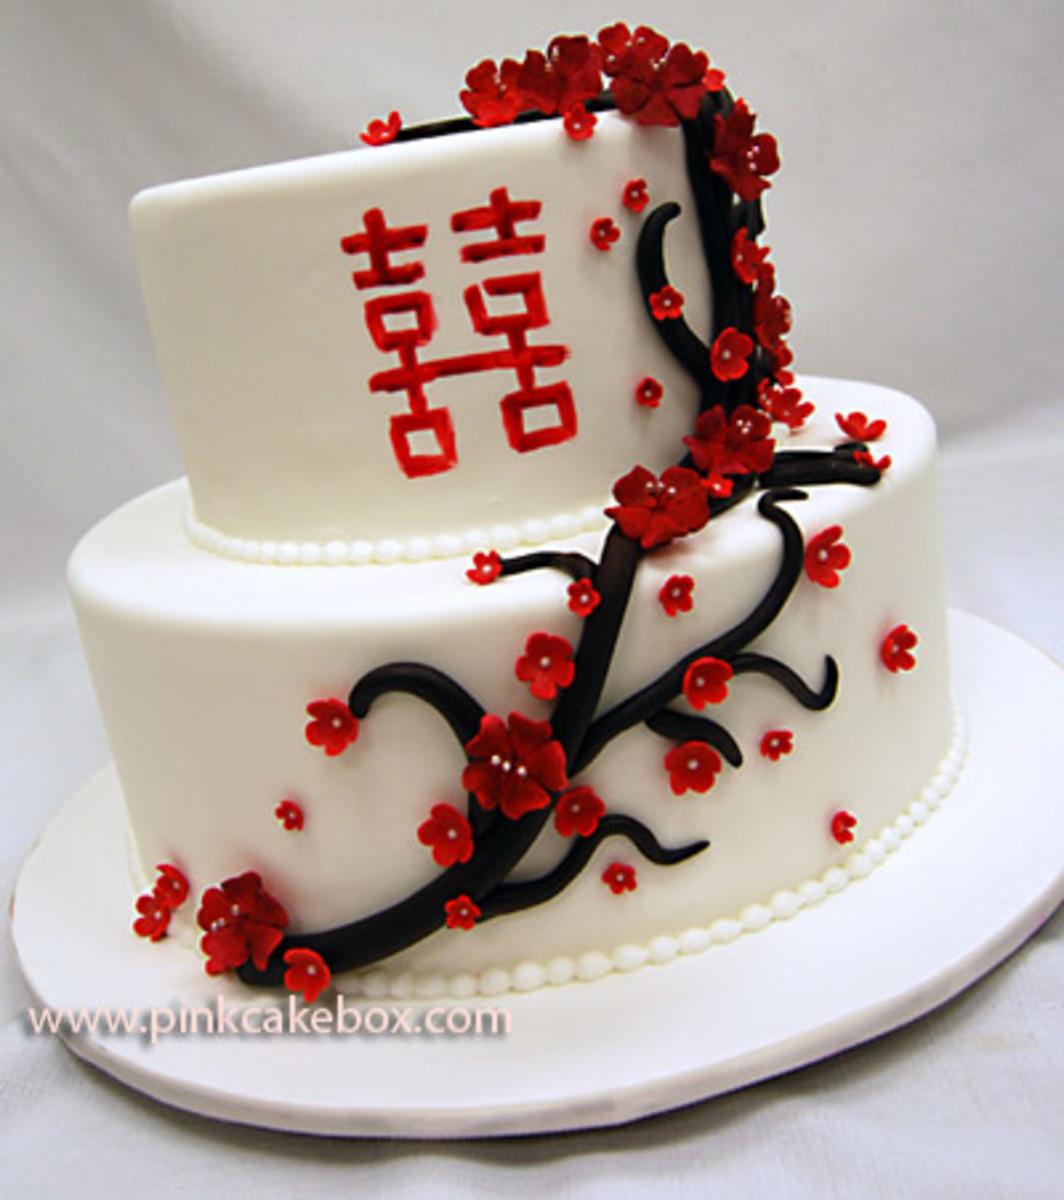 Photo from http://blog.pinkcakebox.com